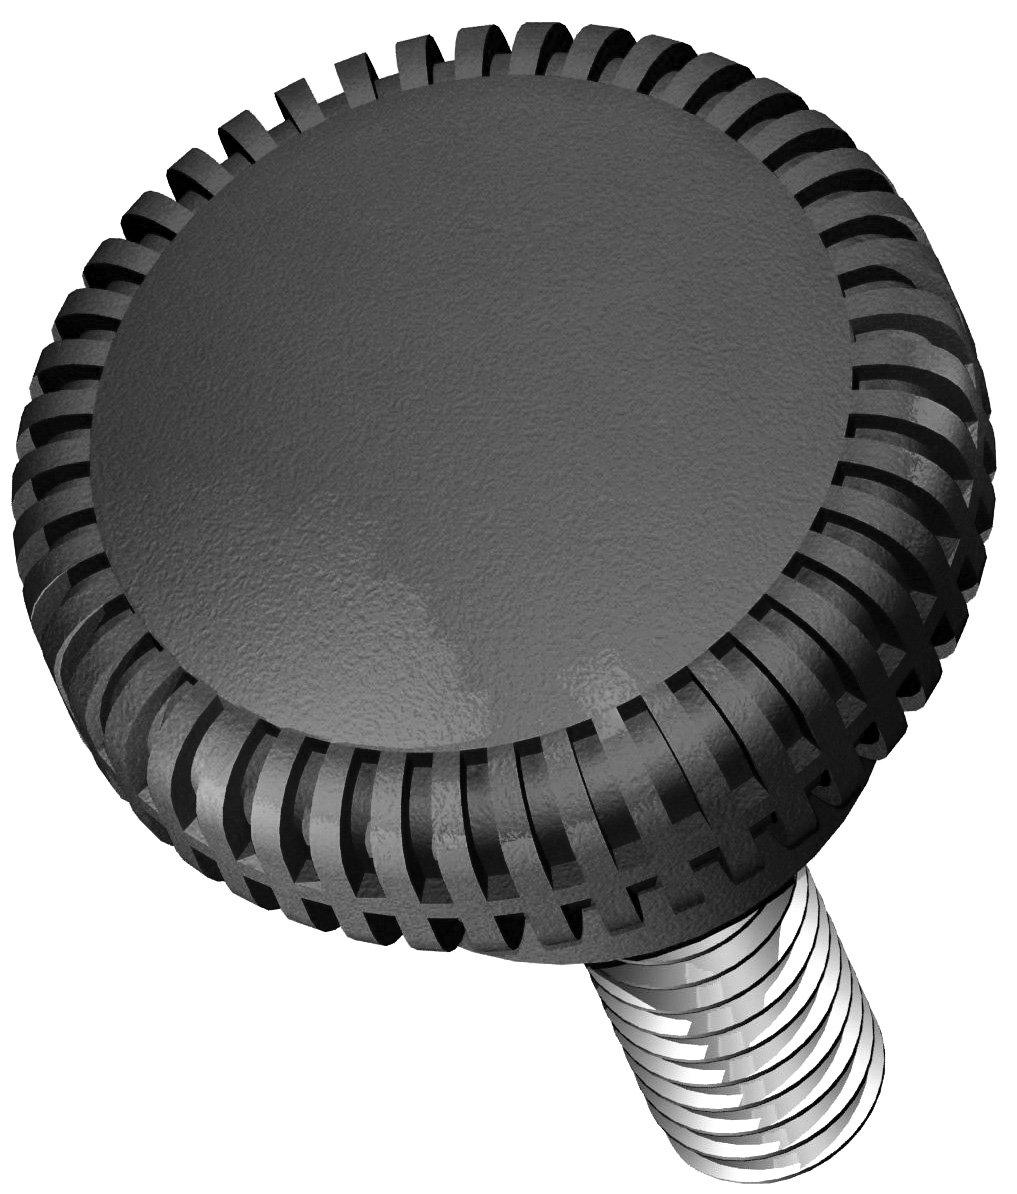 Innovative Components AN4C0625K4A21 1.00'' Knurled knob 1/4-20 X 5/8 steel zinc stud black ABS (Pack of 10)